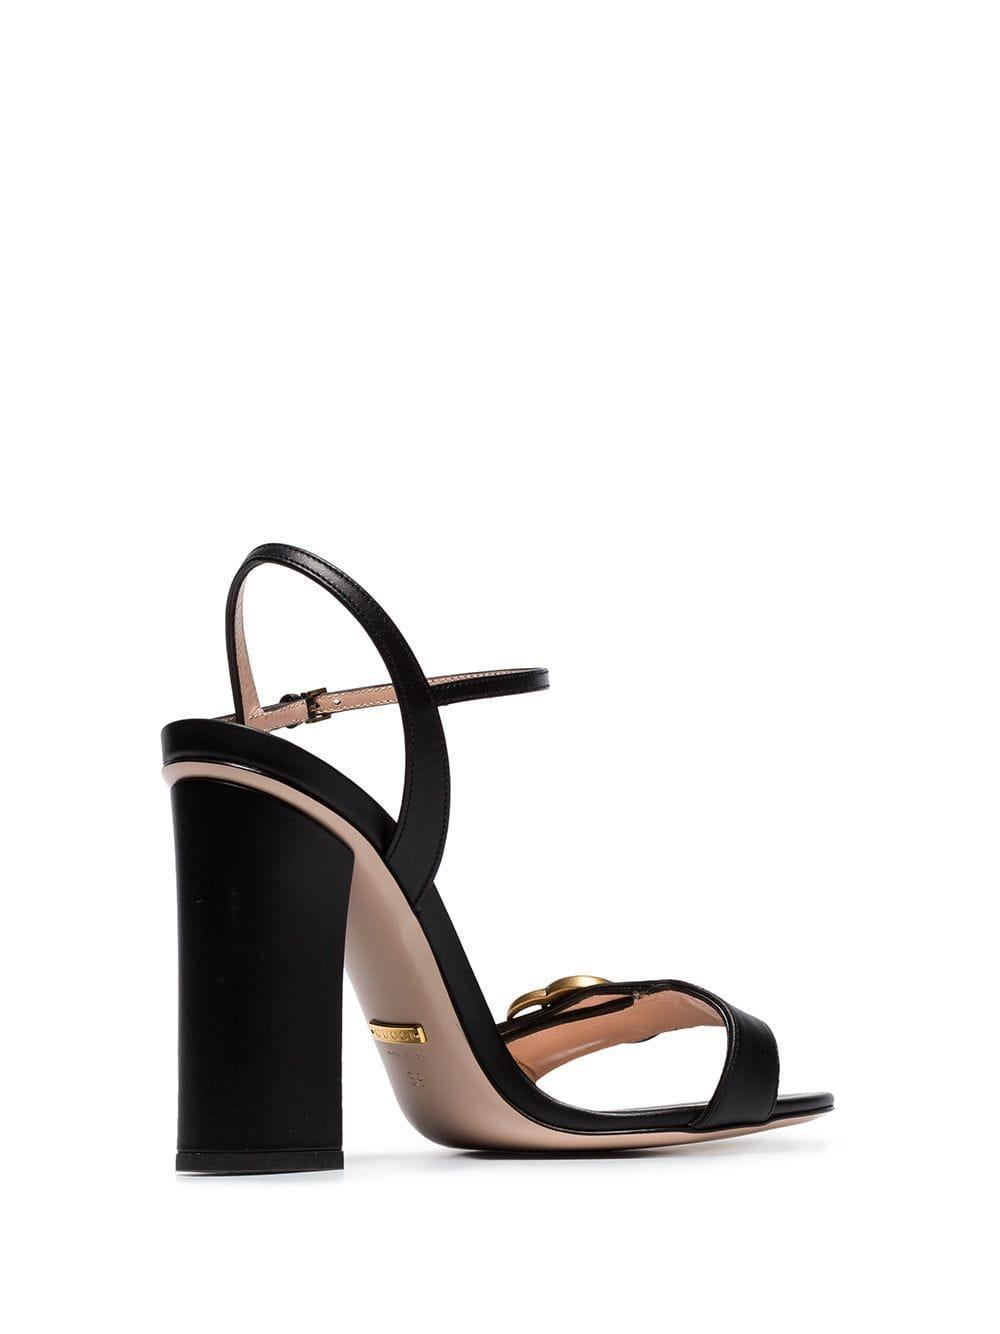 e57cb2931f4 Gucci - Black Marmont 110 Chunky Heel Leather Sandals - Lyst. View  fullscreen